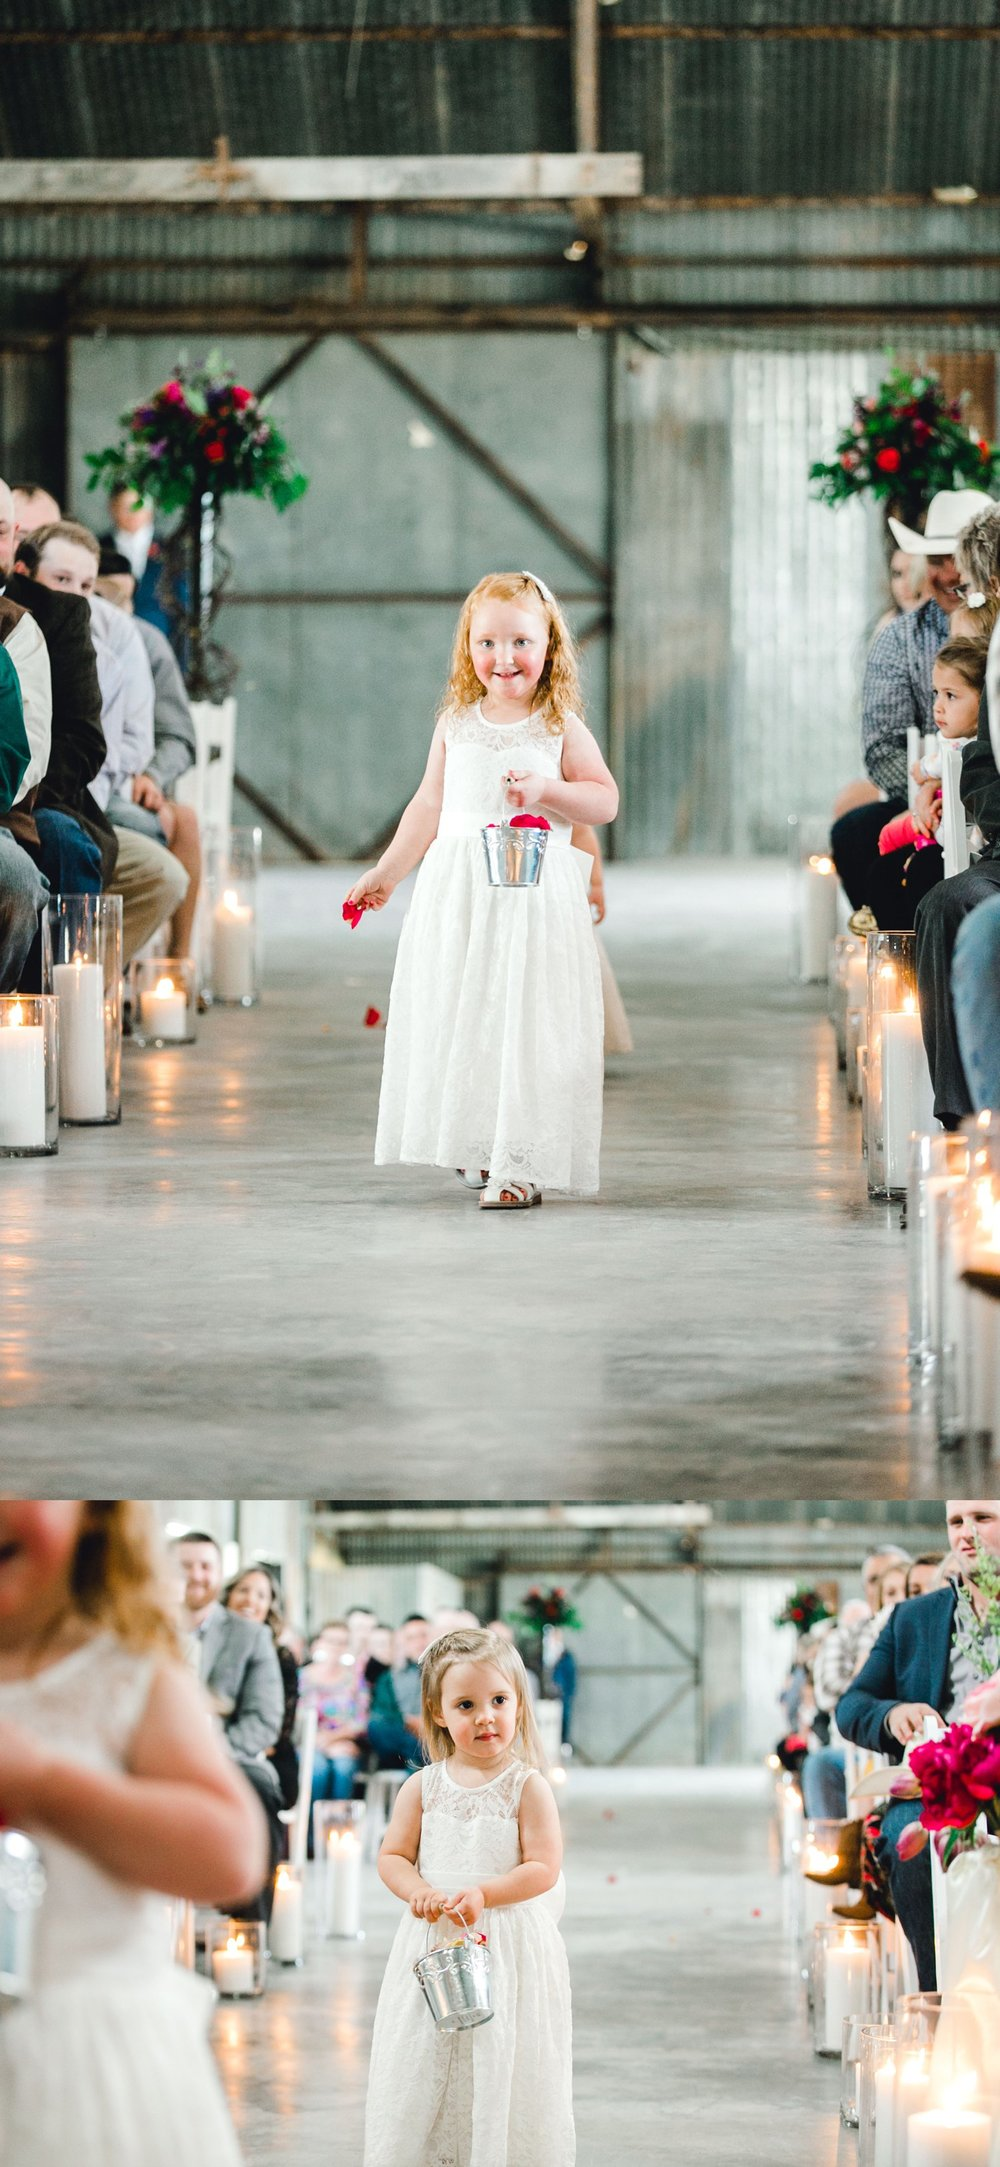 Jenna-and-garrett-Everett-kitalou-gin-lubbock-wedding-dayspring-designs-lubbock-wedding-photographer_0087.jpg